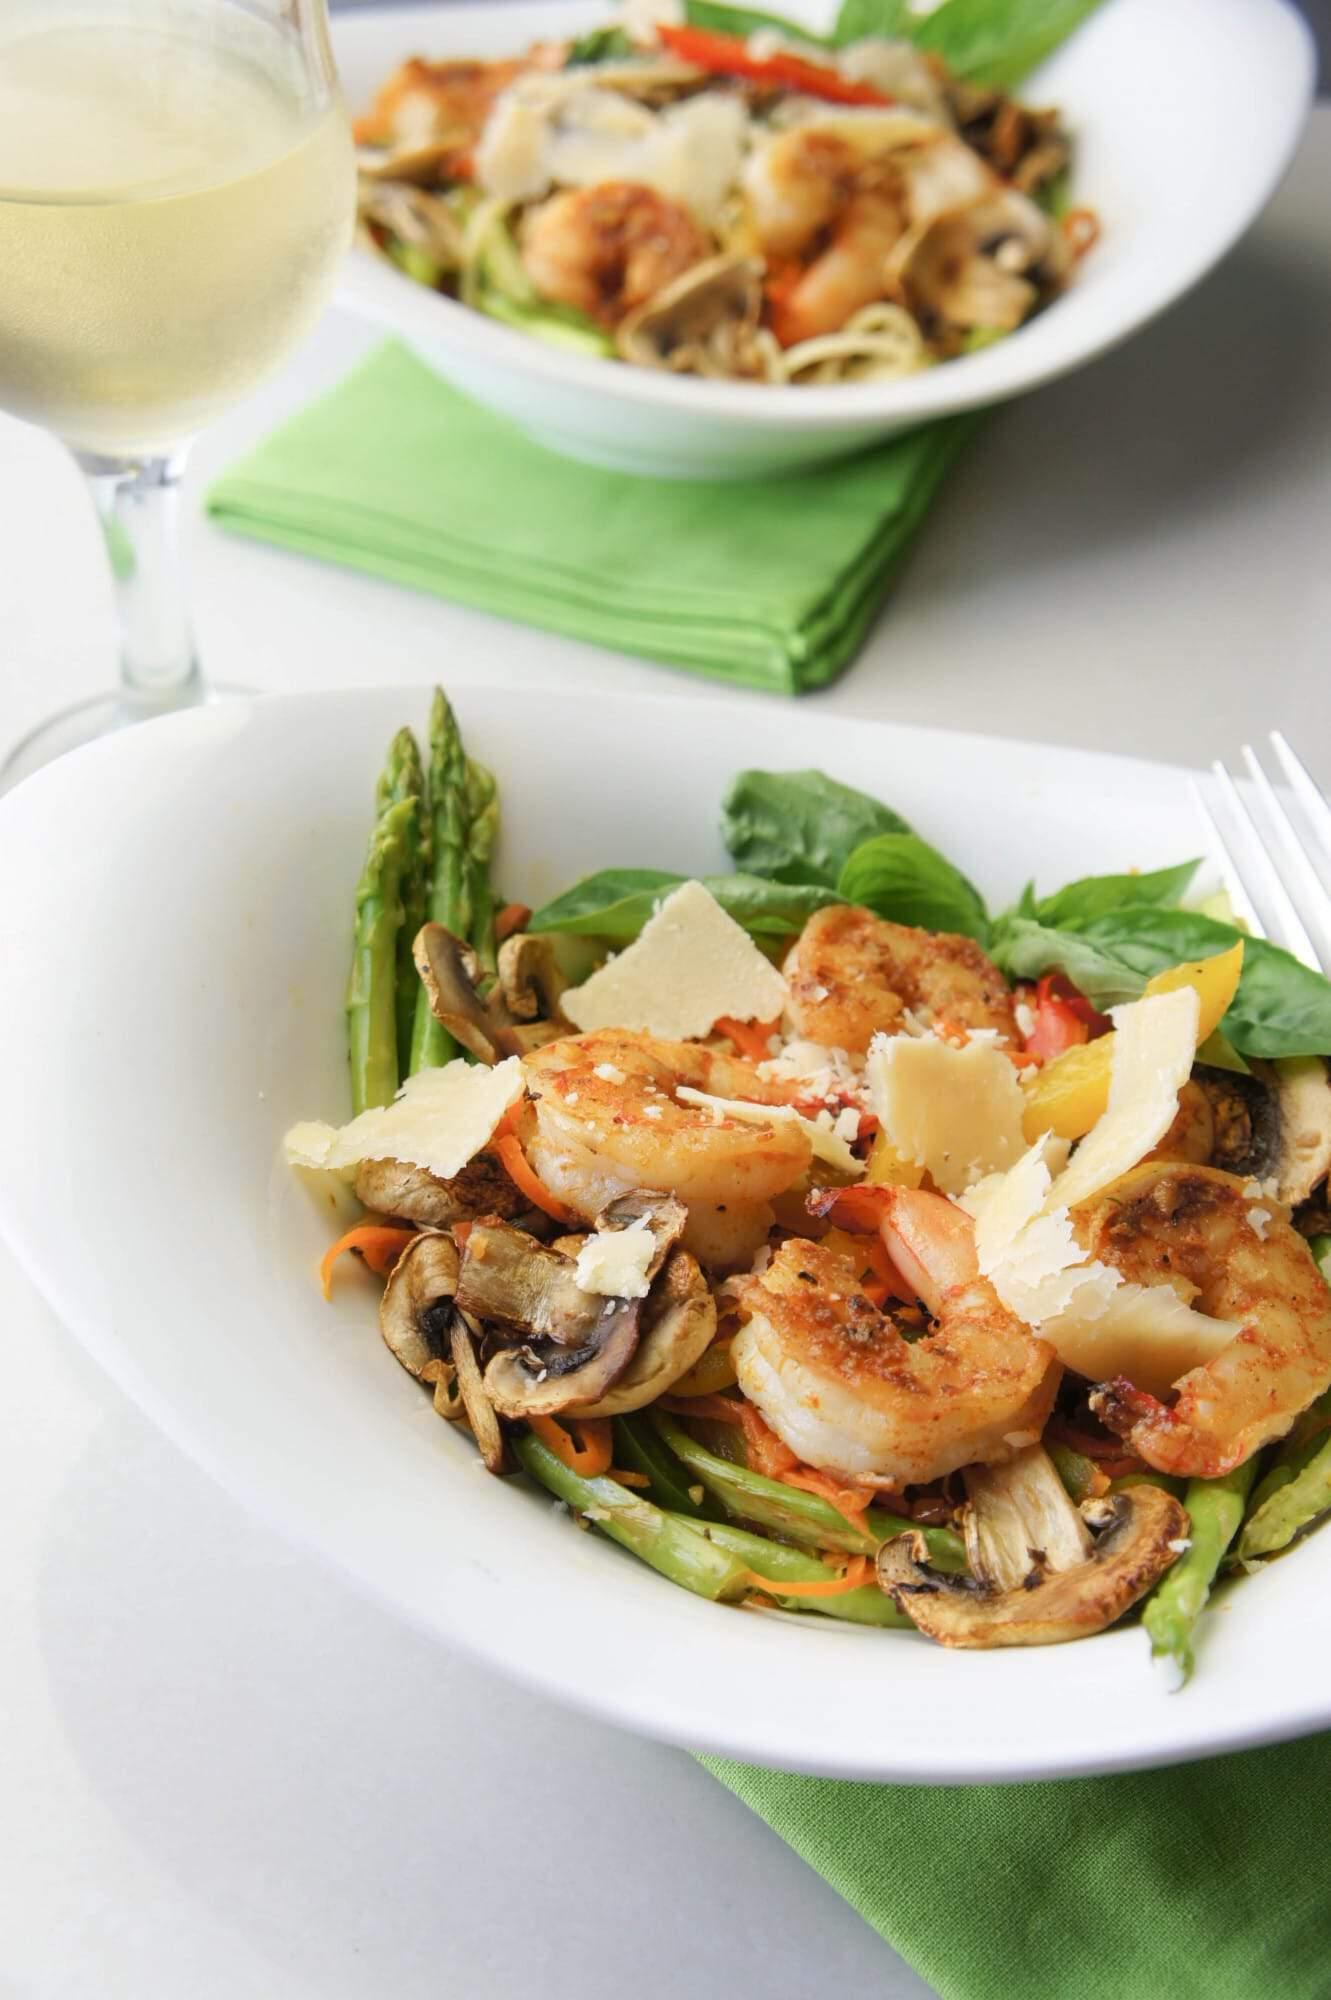 Summer Veggies With Pasta And Shrimp Recipes — Dishmaps